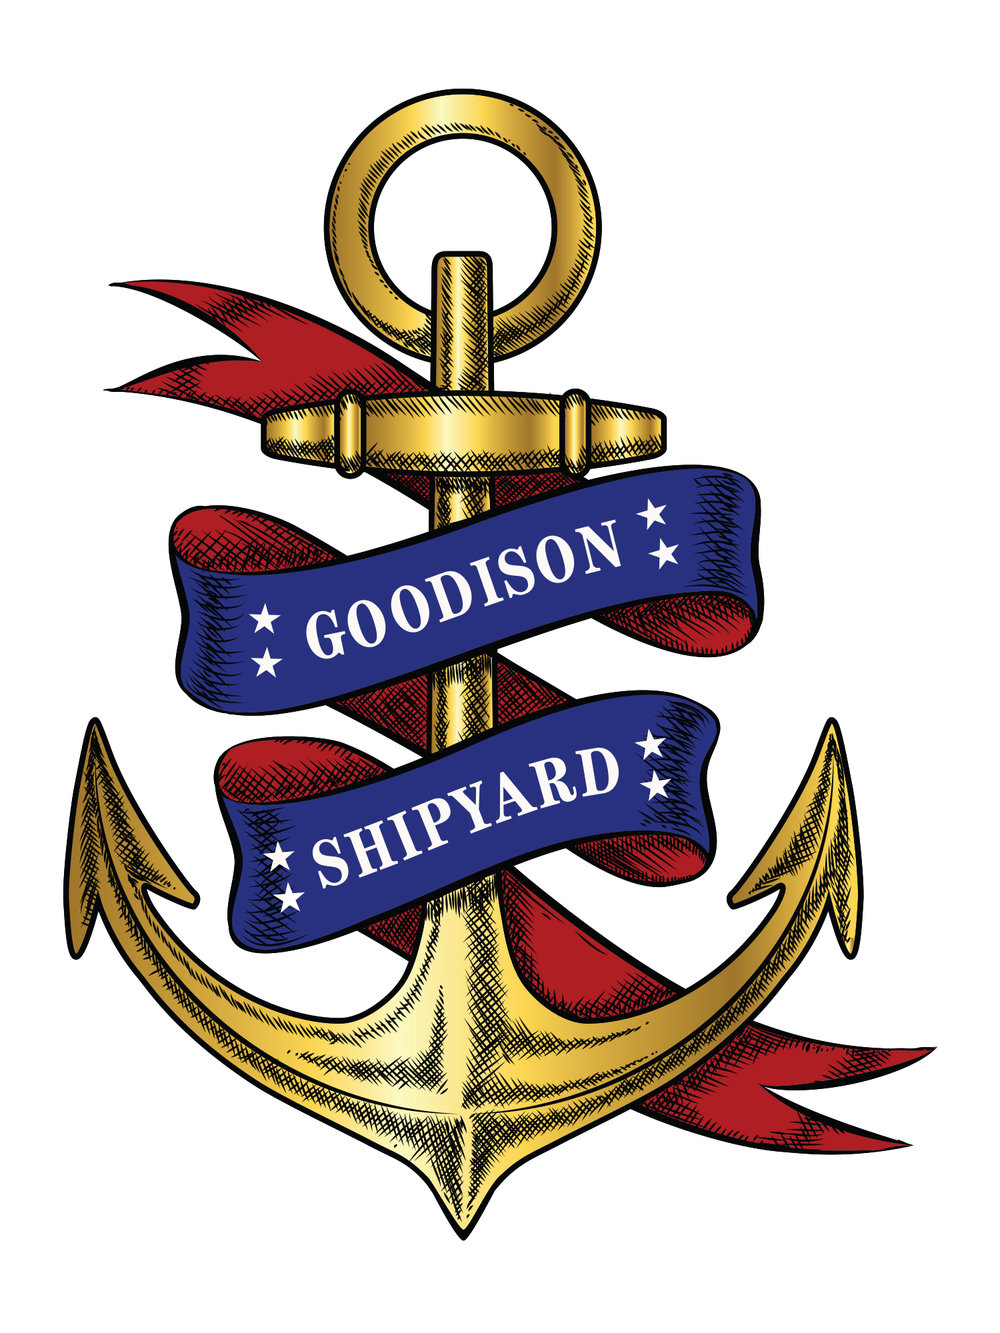 Goodison_Shipyard_Logo_JPG.jpg